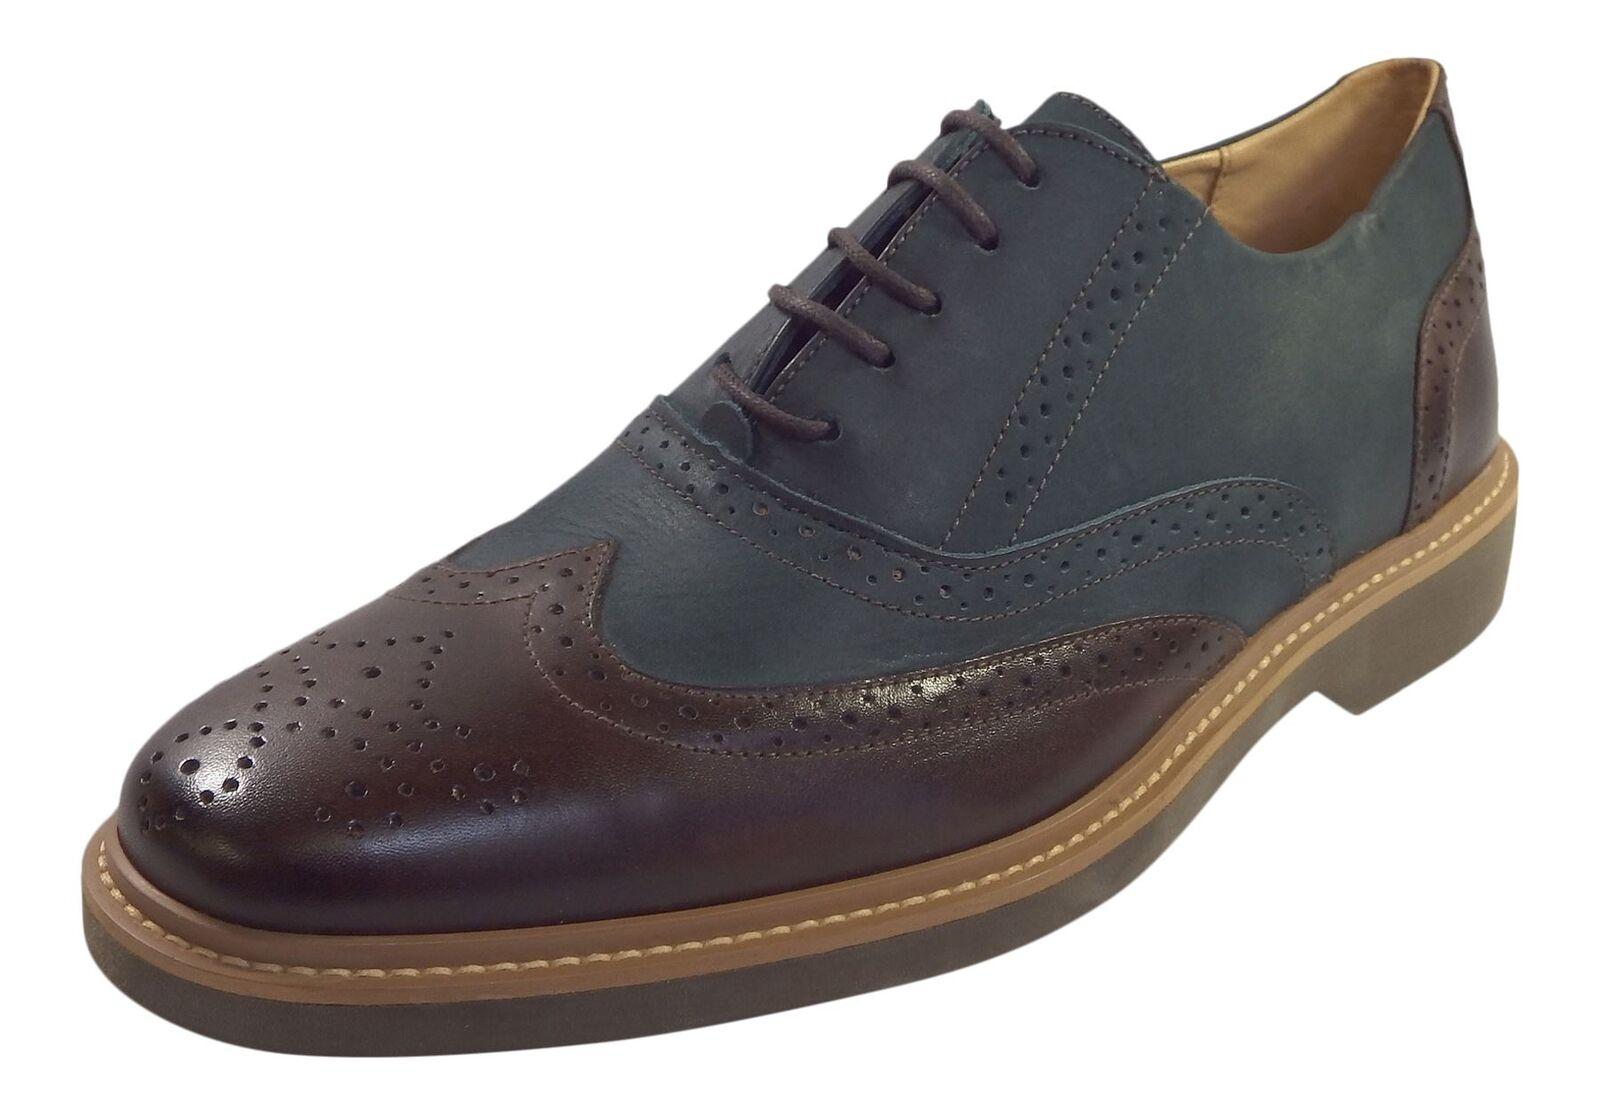 Anatomic Mens Pilar Indigo Castanho Luxury Leather Brogue Goodyear Welted Shoes